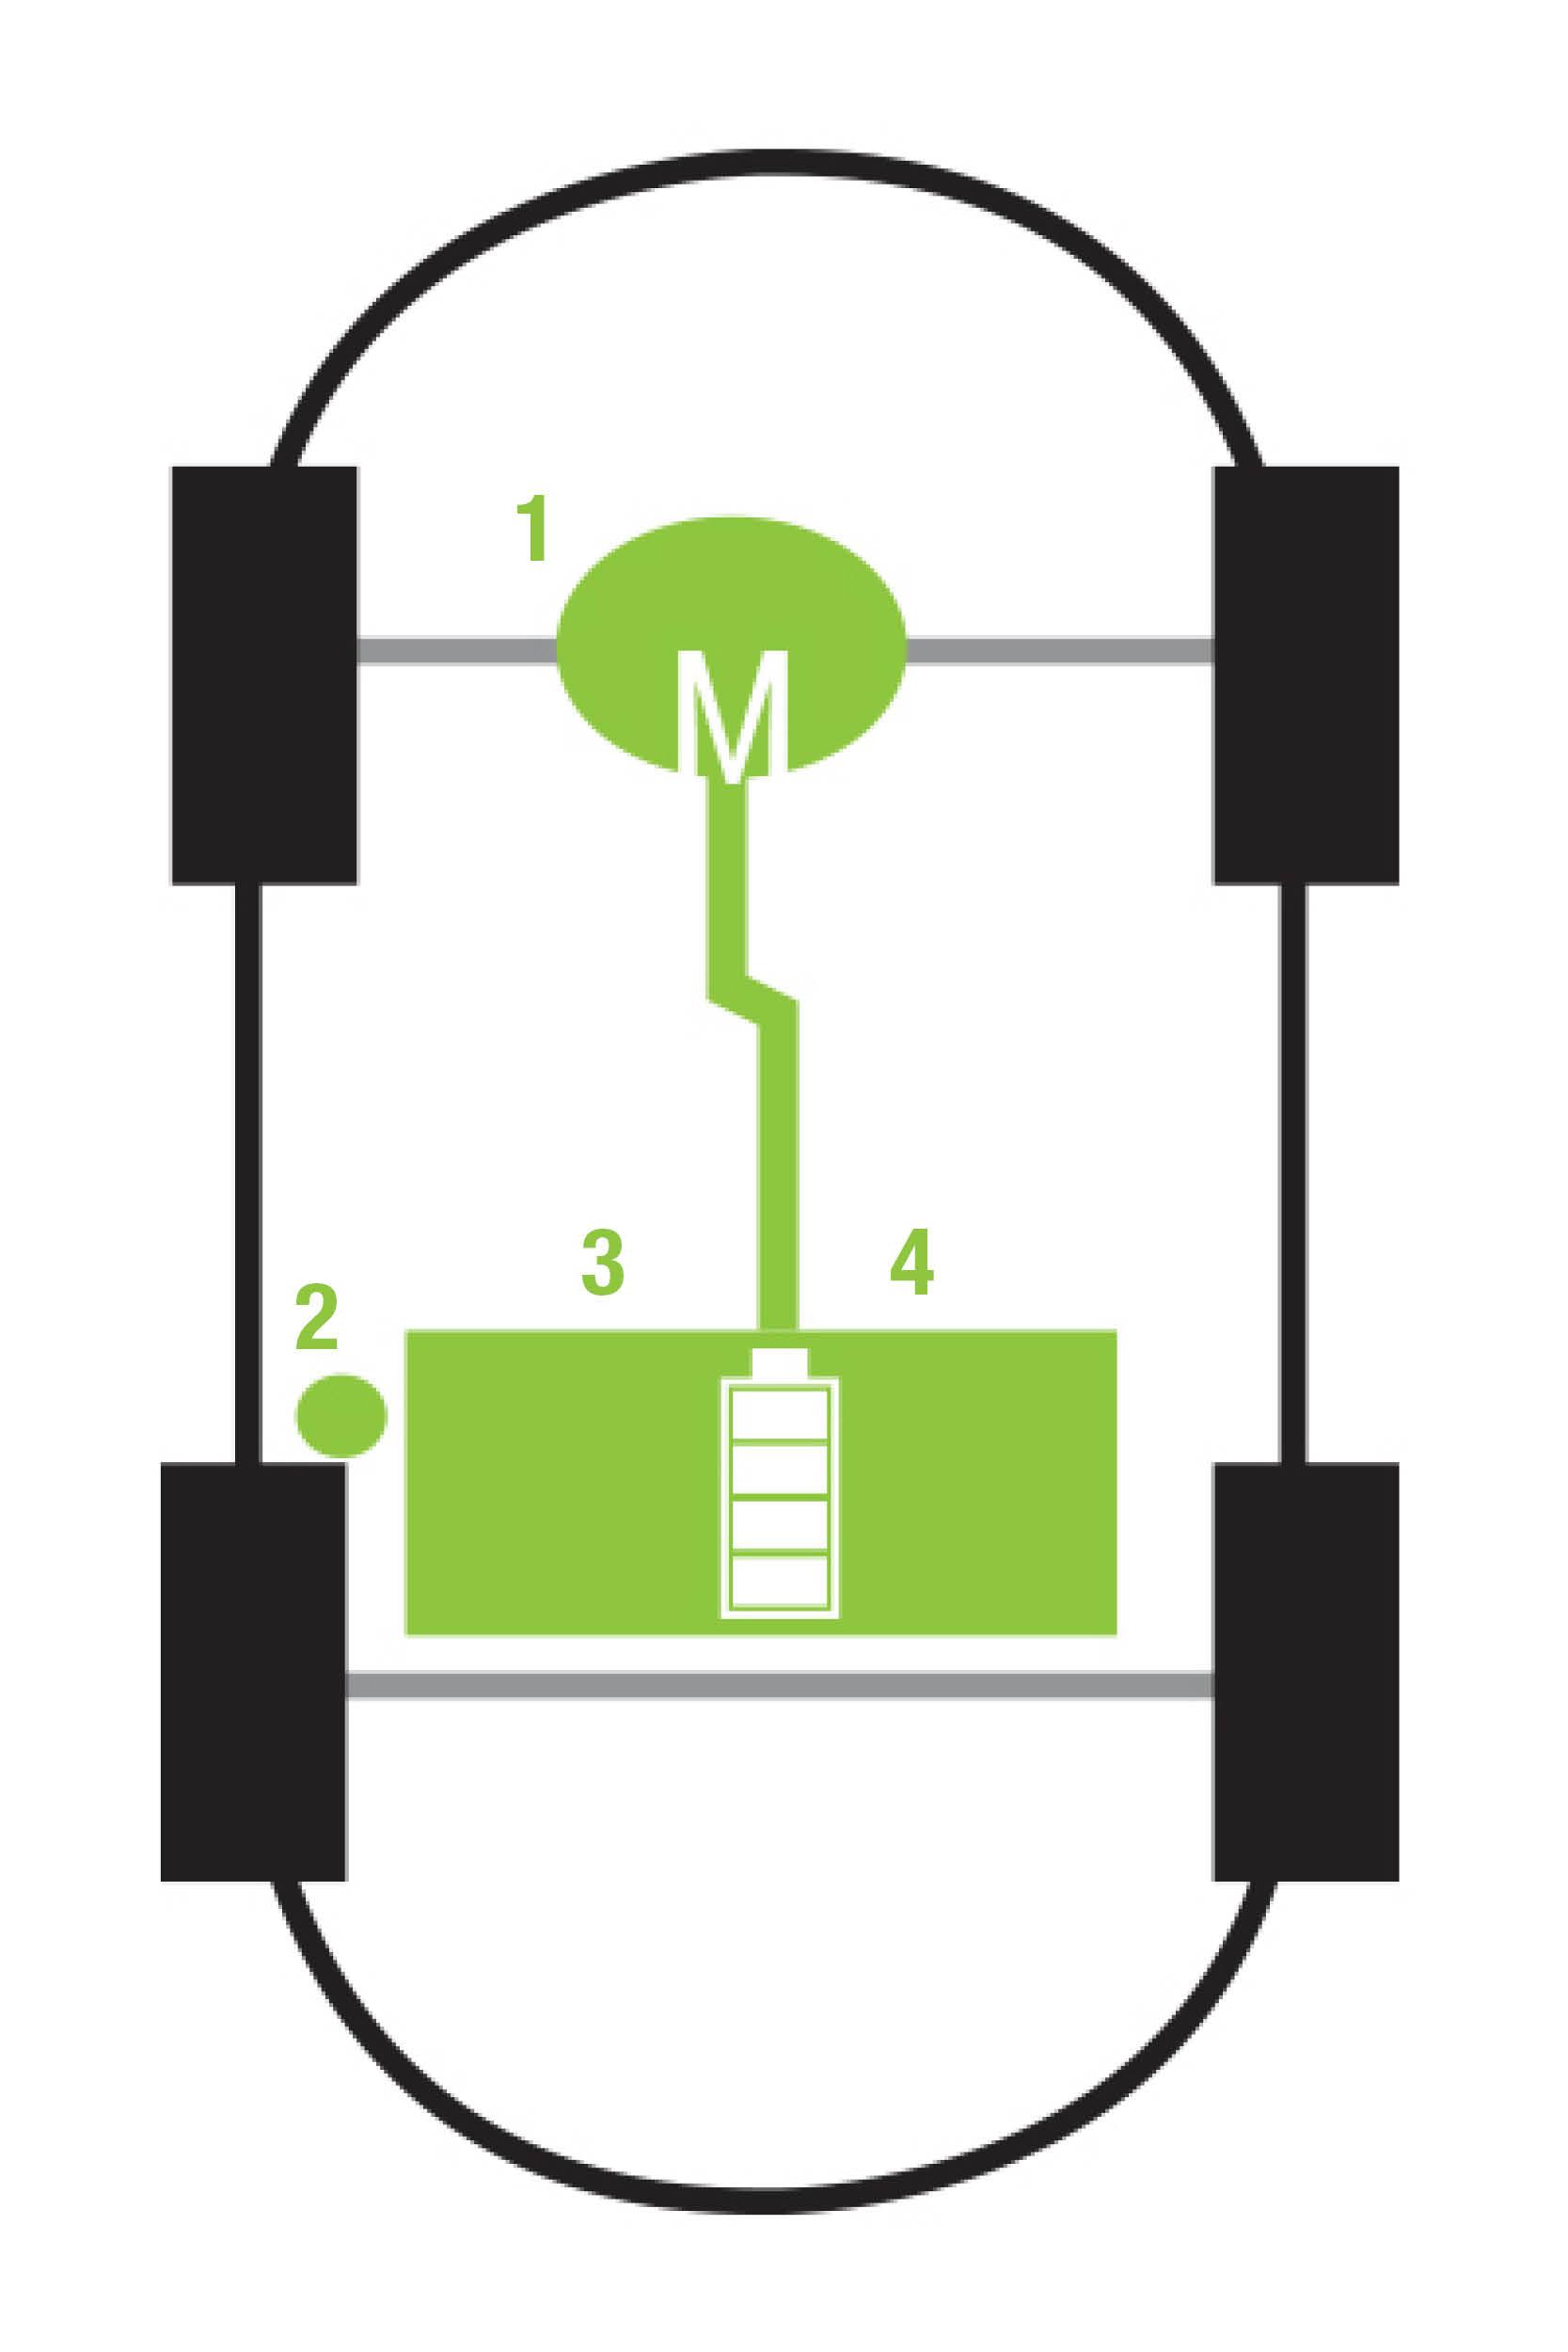 fega schmitt elektrogro handel wie ist ein elektroauto aufgebaut elektromobilit t. Black Bedroom Furniture Sets. Home Design Ideas